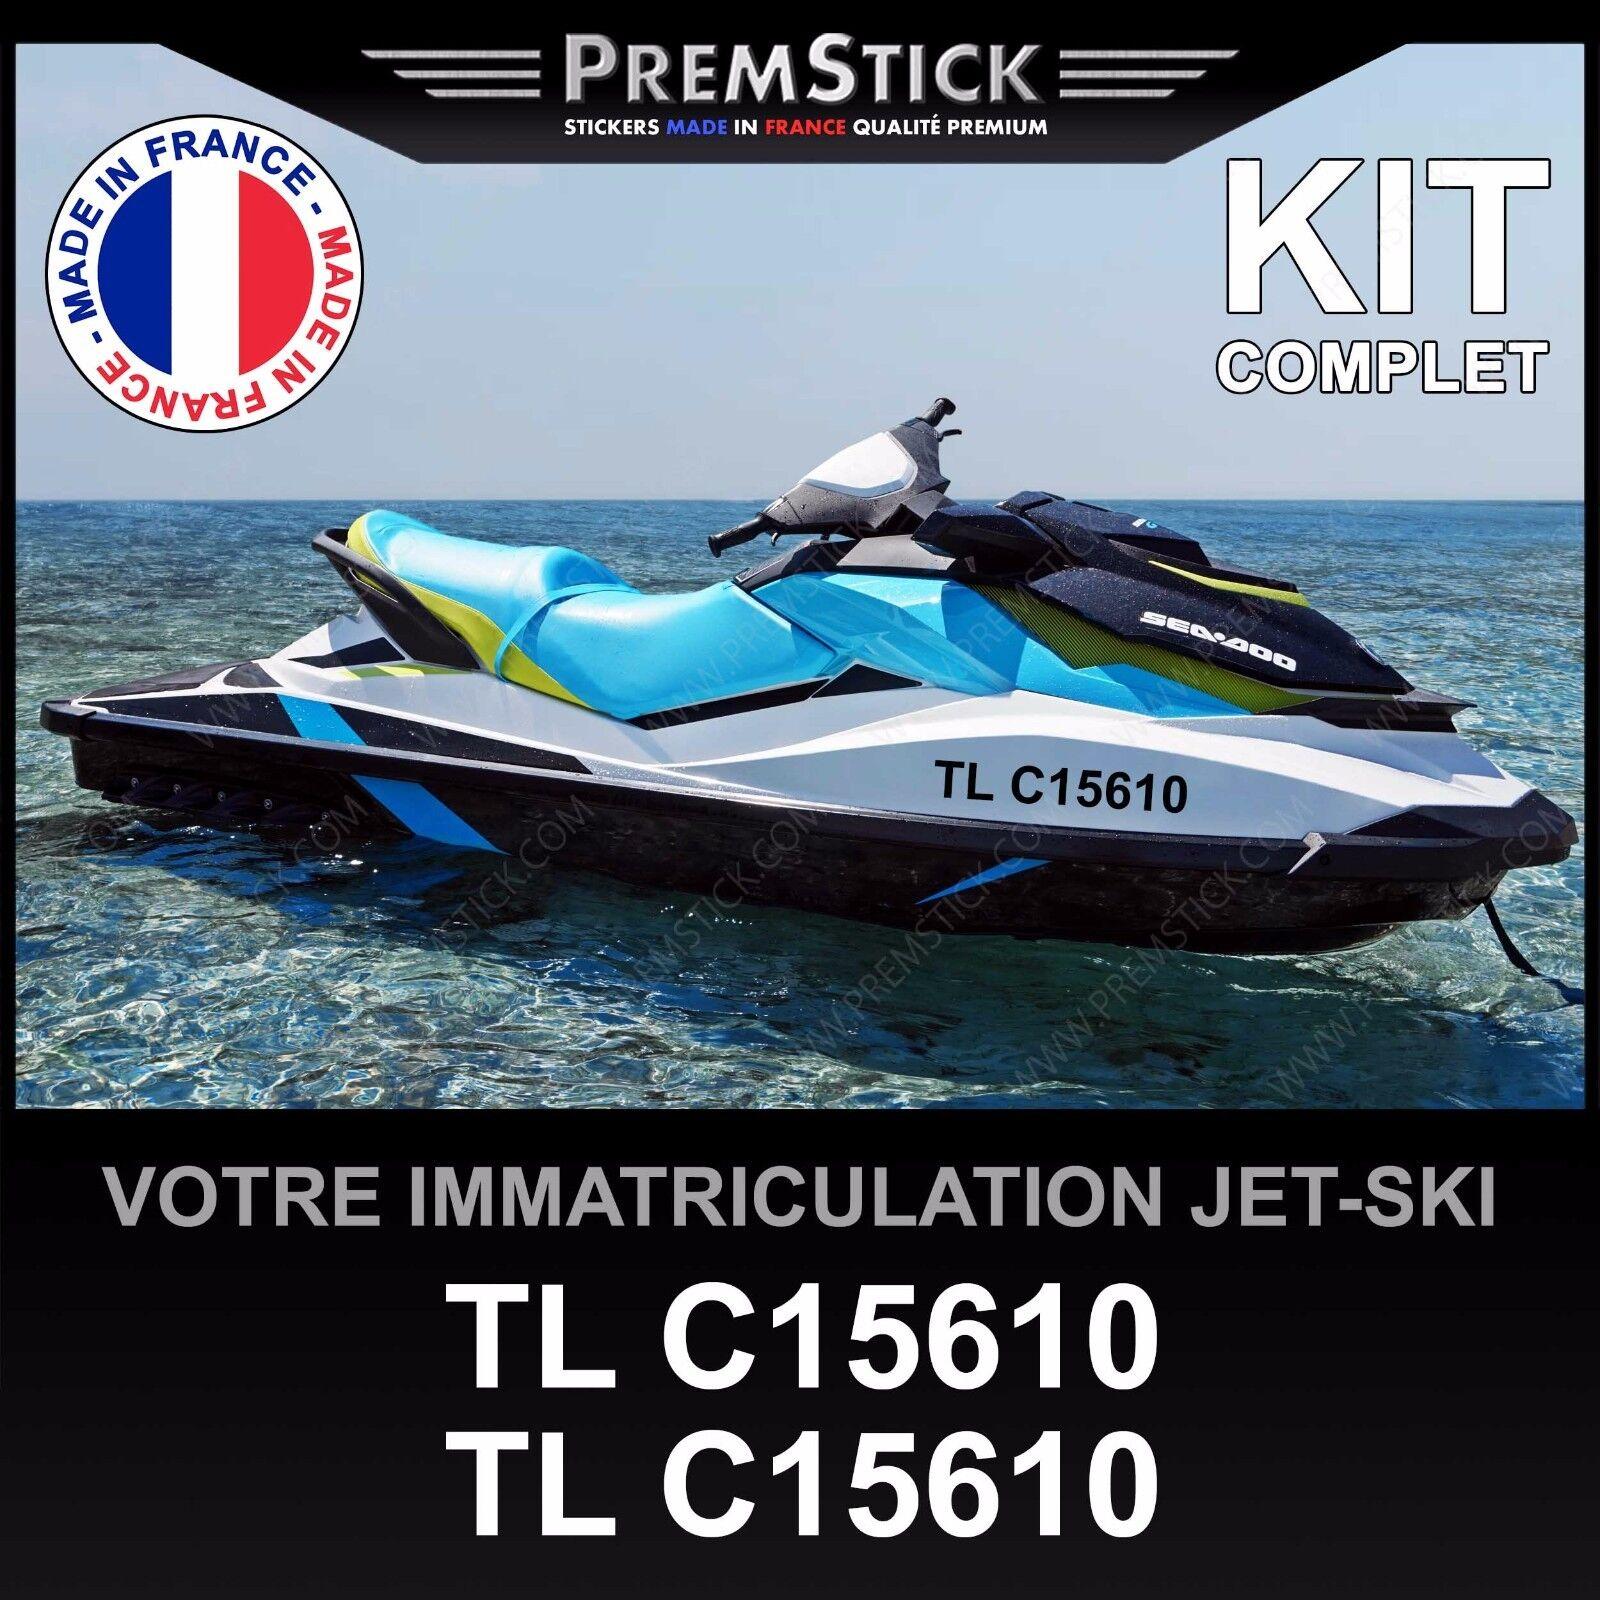 Kit Aufkleber Zulassung Jet-Ski ; selbstklebend benutzerdefiniert Jet a Bügel